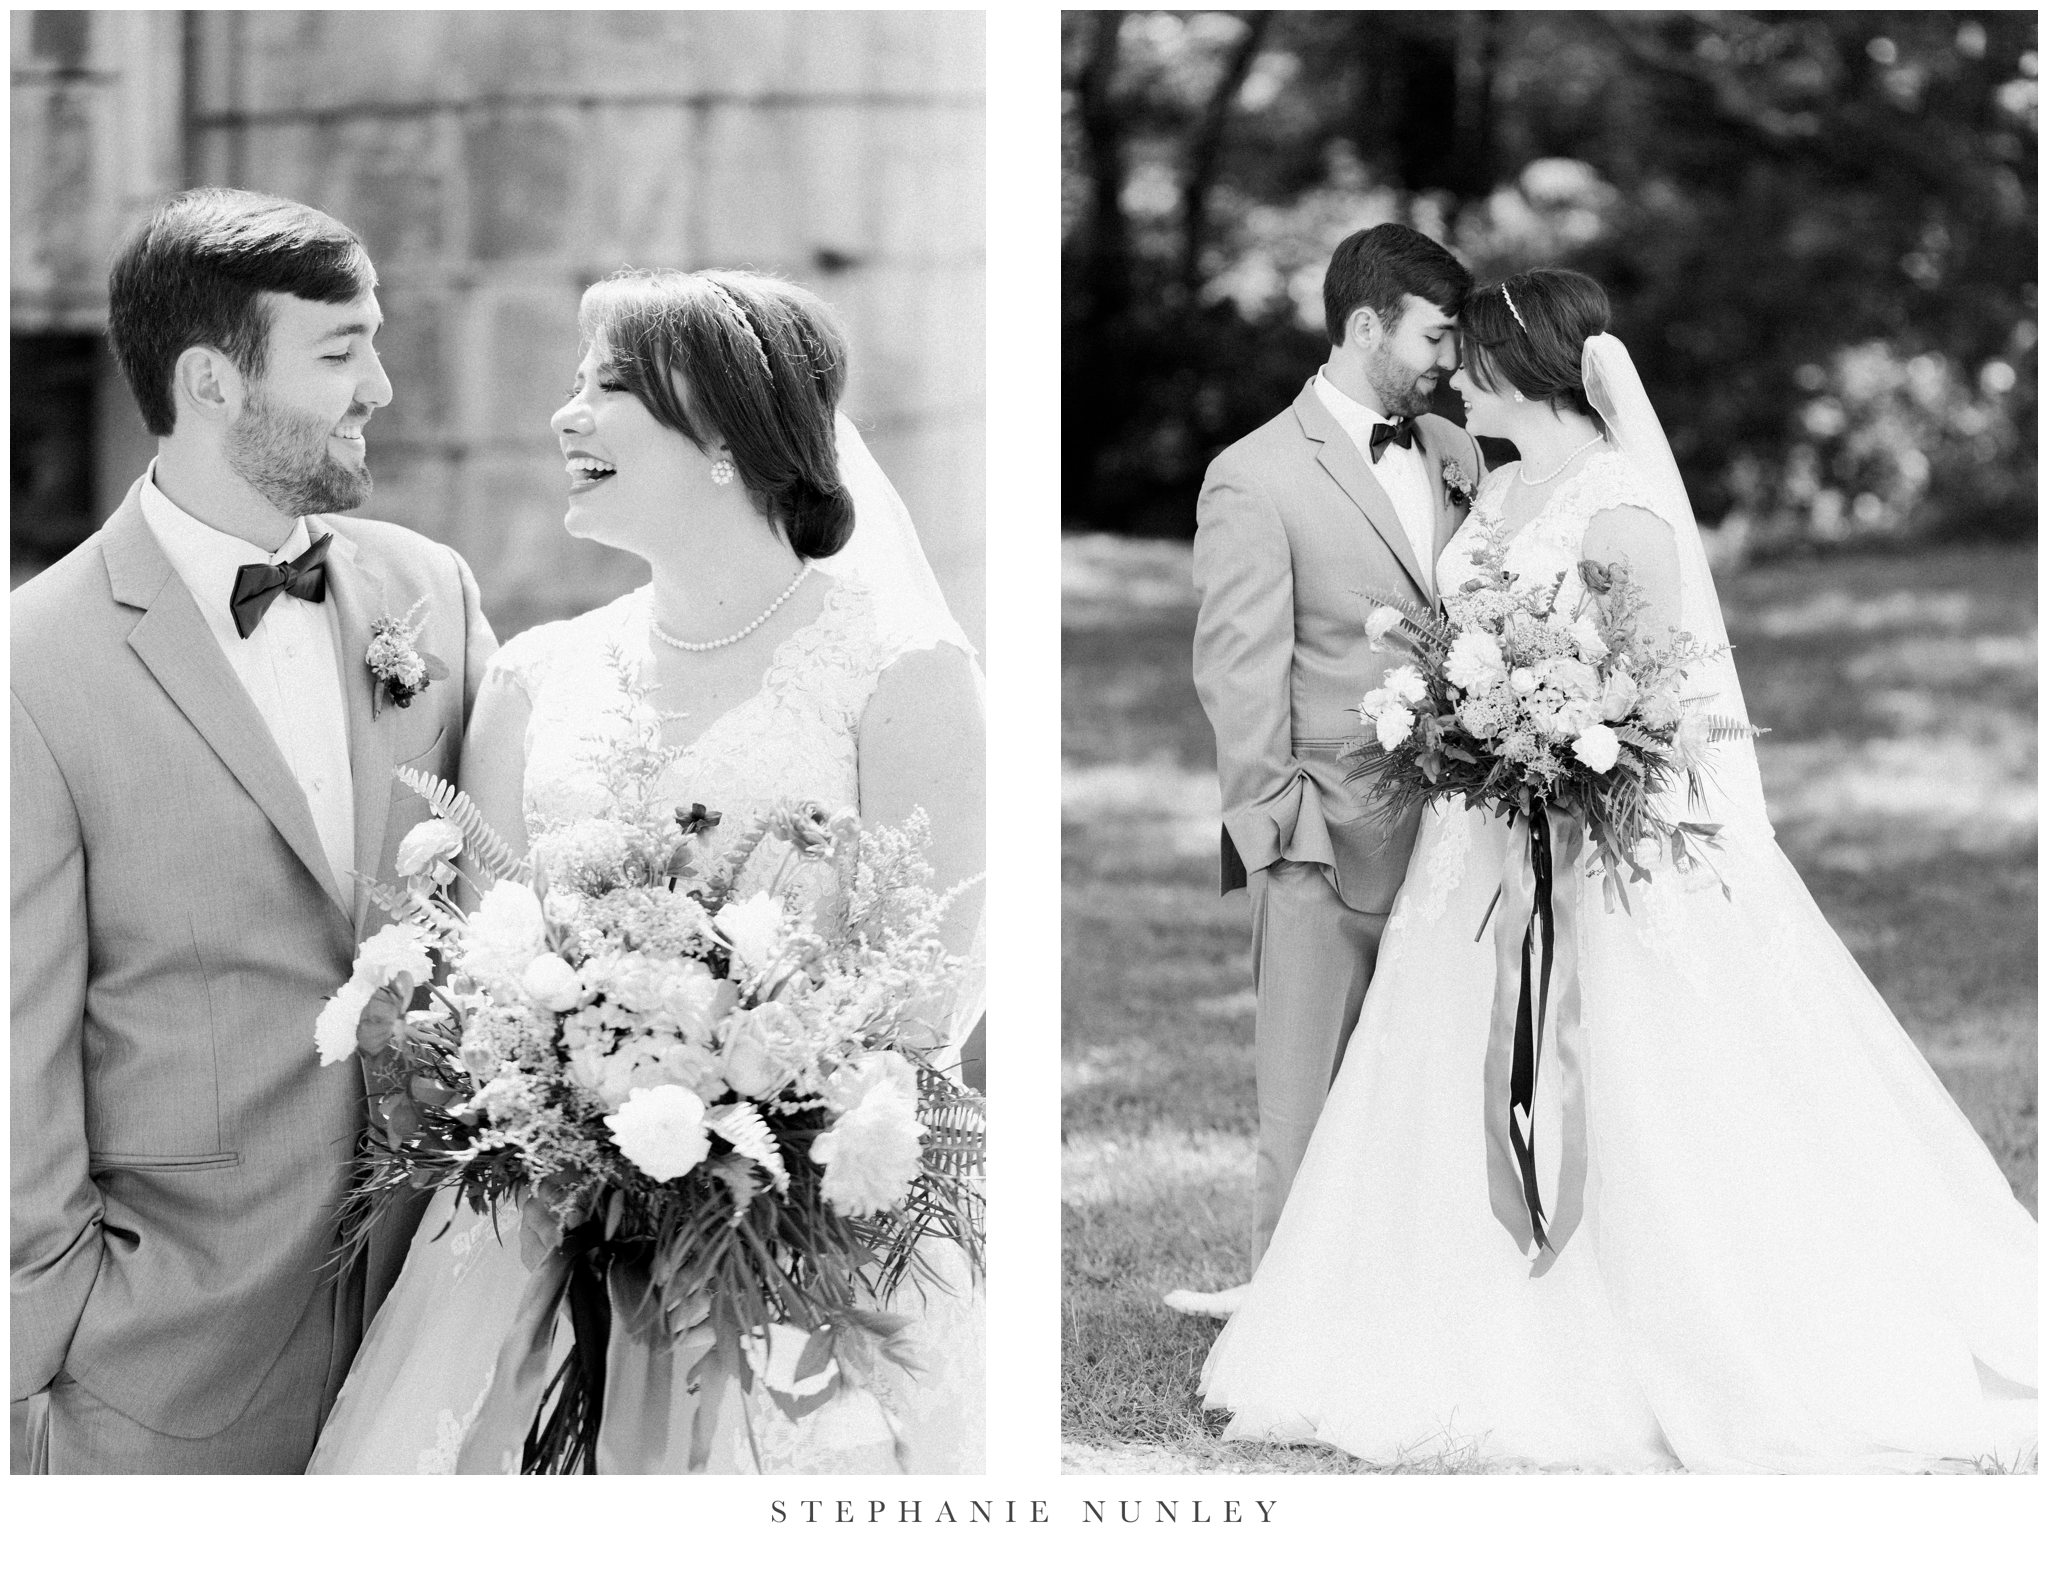 arkansas-wedding-with-lush-wildflower-bouquet-0039.jpg